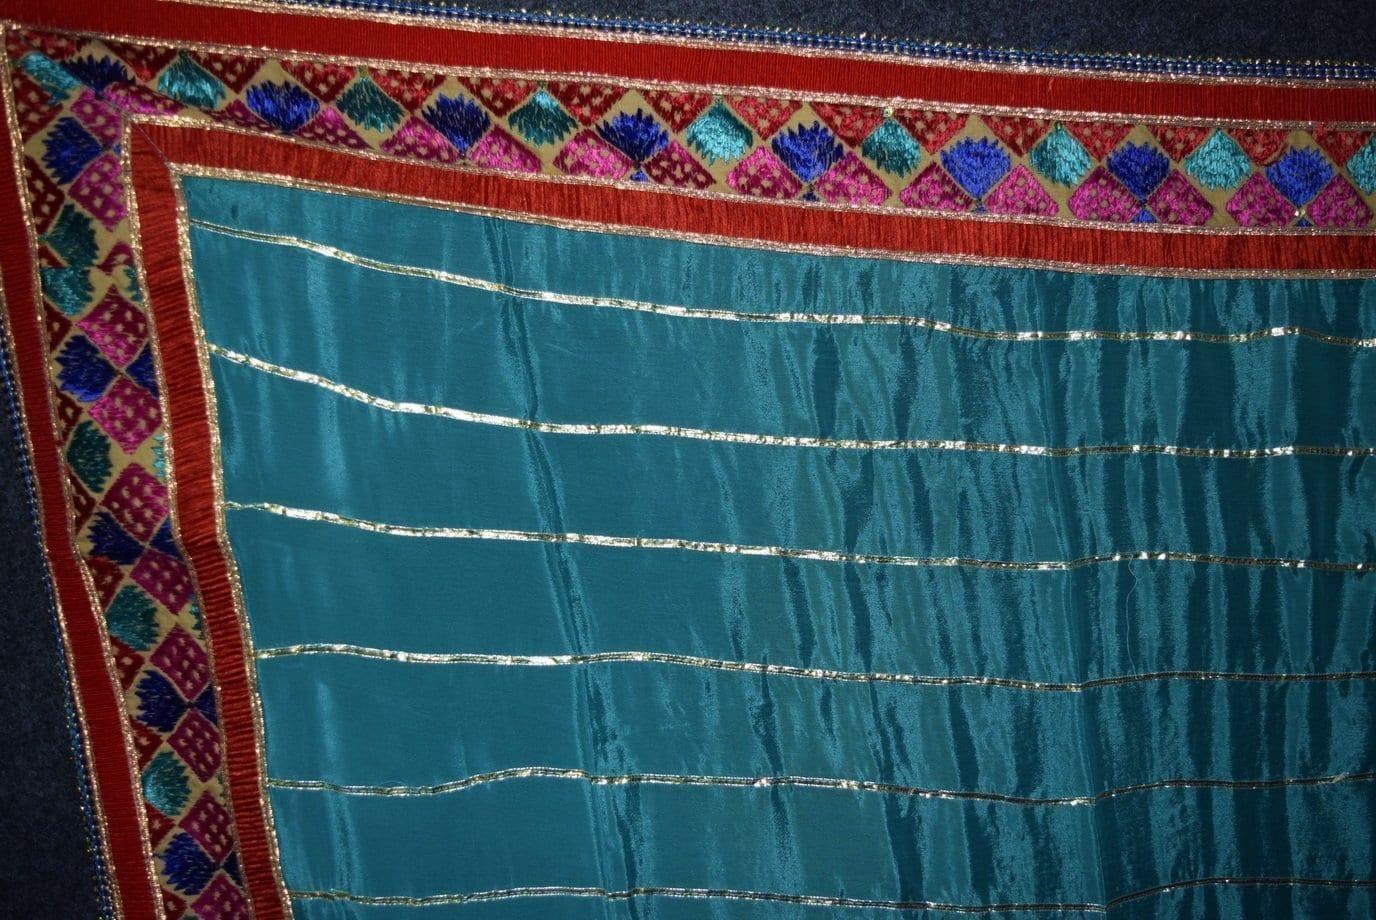 Glazed Cotton Hand Embroidered Salwar kameez suit CHINON DUPATTA set F0658 2